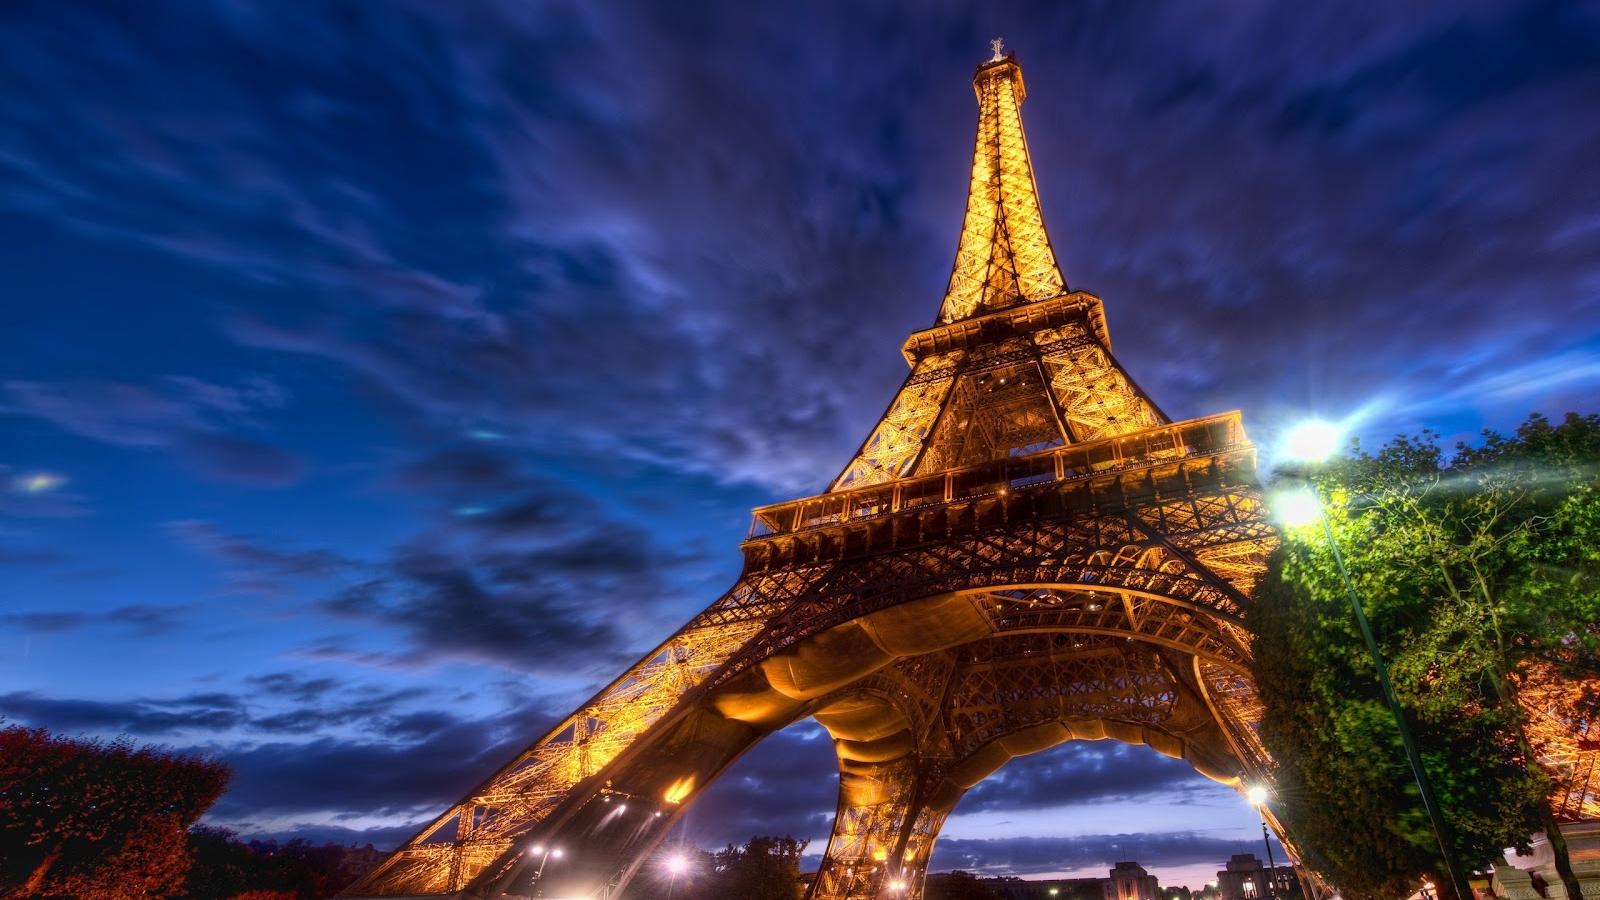 Free Download Paris Hd Wallpapers Beautiful Paris Hd Wallpapers Beautiful Paris Hd 1600x1000 For Your Desktop Mobile Tablet Explore 47 Paris Wallpaper Hd Pics Of Paris France Wallpaper Paris